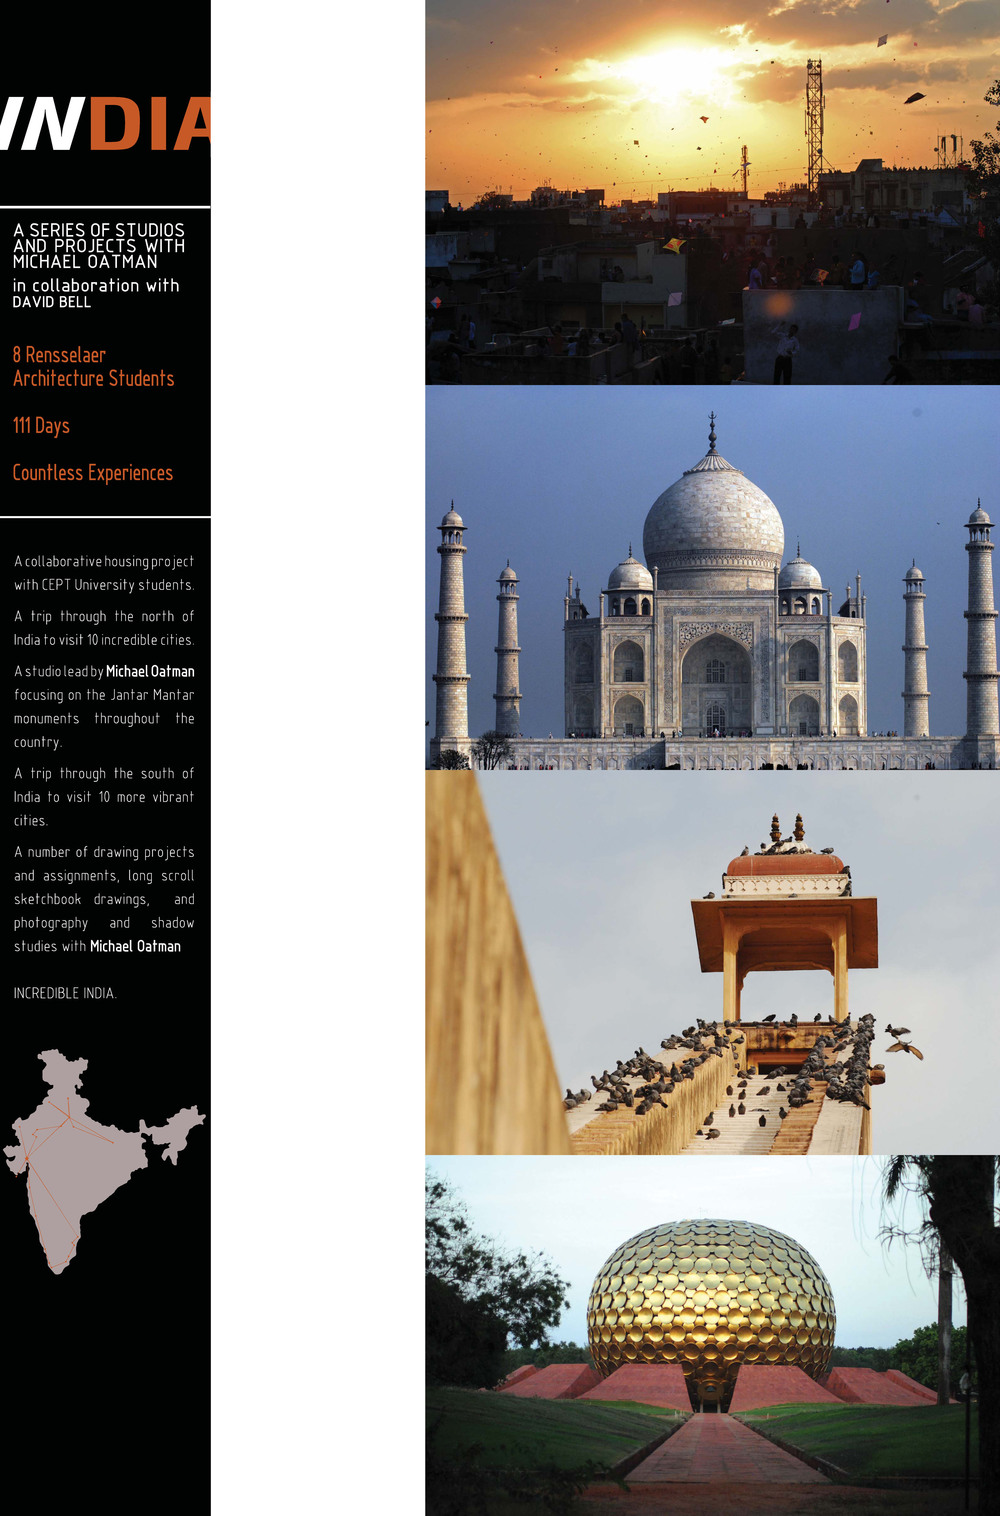 IndiaExhibit_CUBE BOARDS_1.jpg